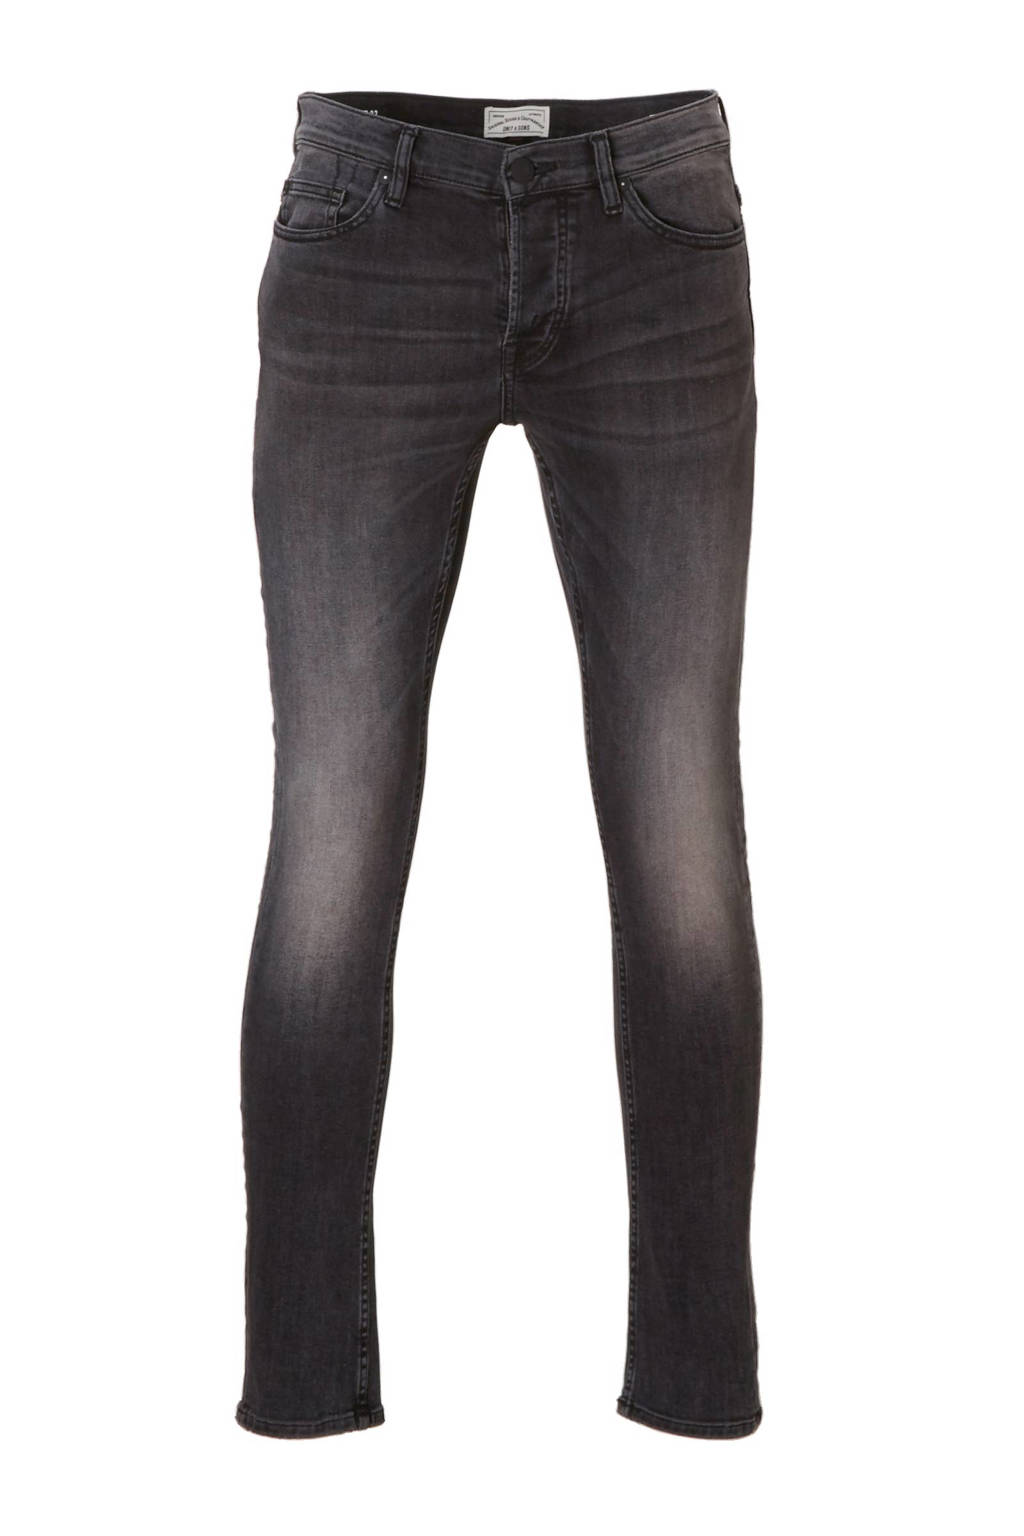 Only & Sons slim fit jeans Loom, Black Denim 0447